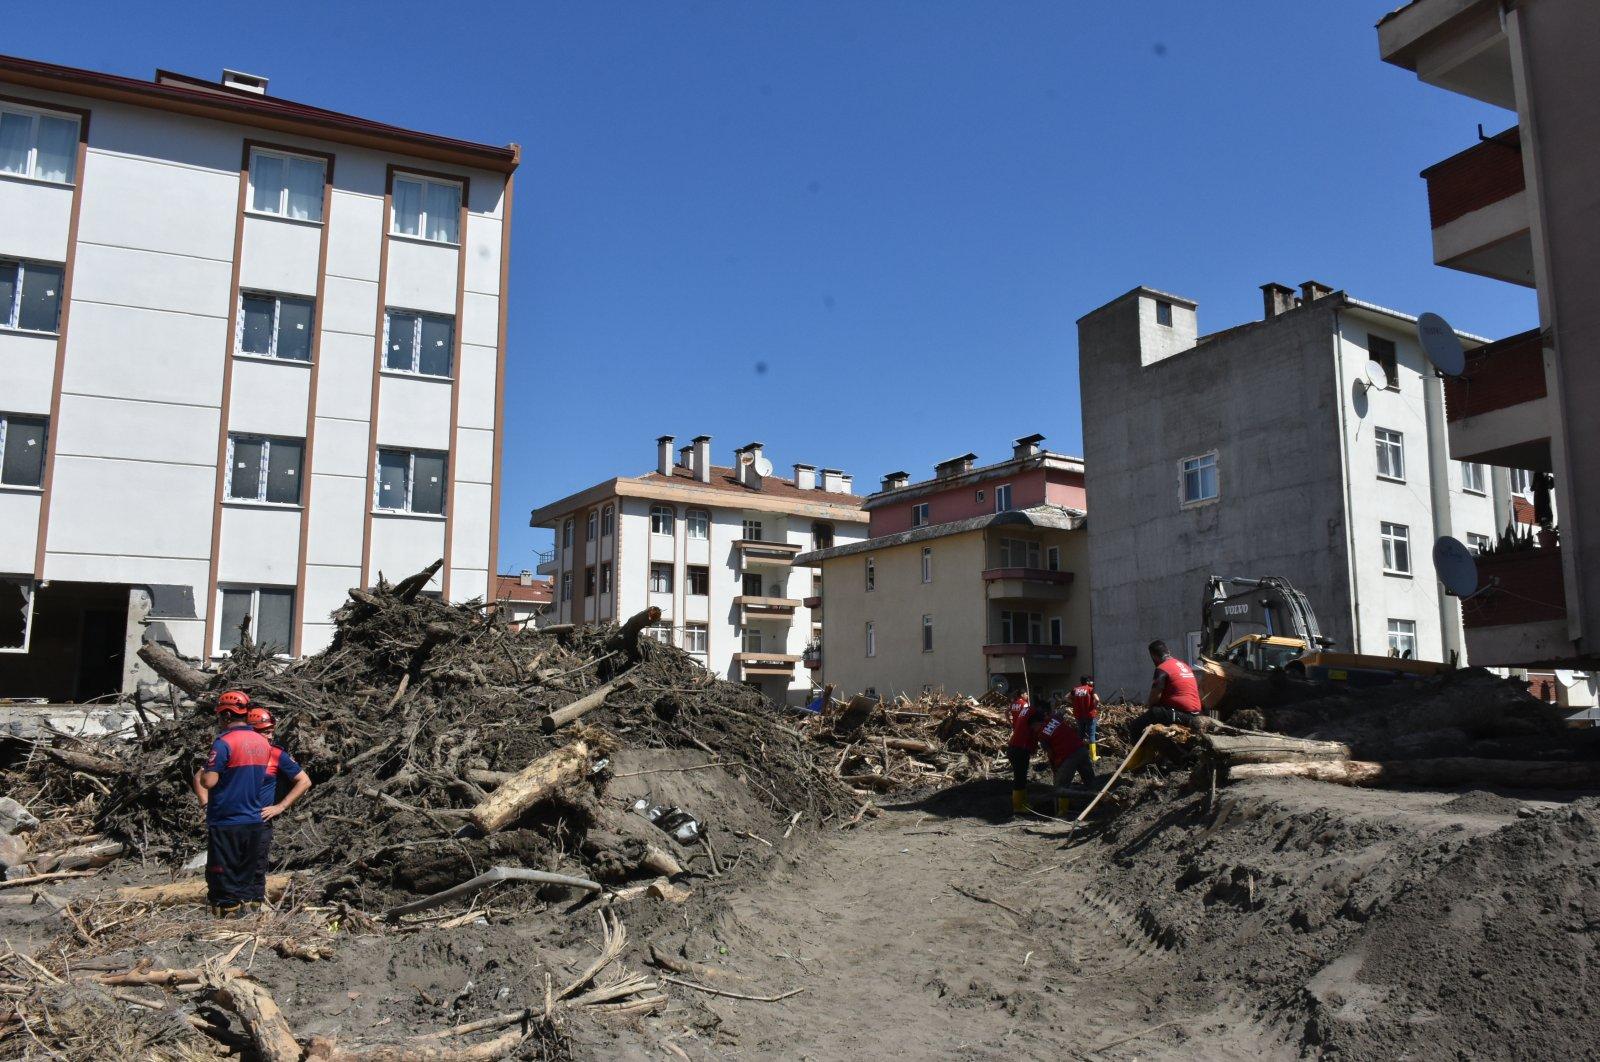 Workers clean the debris from the streets in flood-hit Bozkurt, Kastamonu, northern Turkey, Aug. 17, 2021. (AA PHOTO)